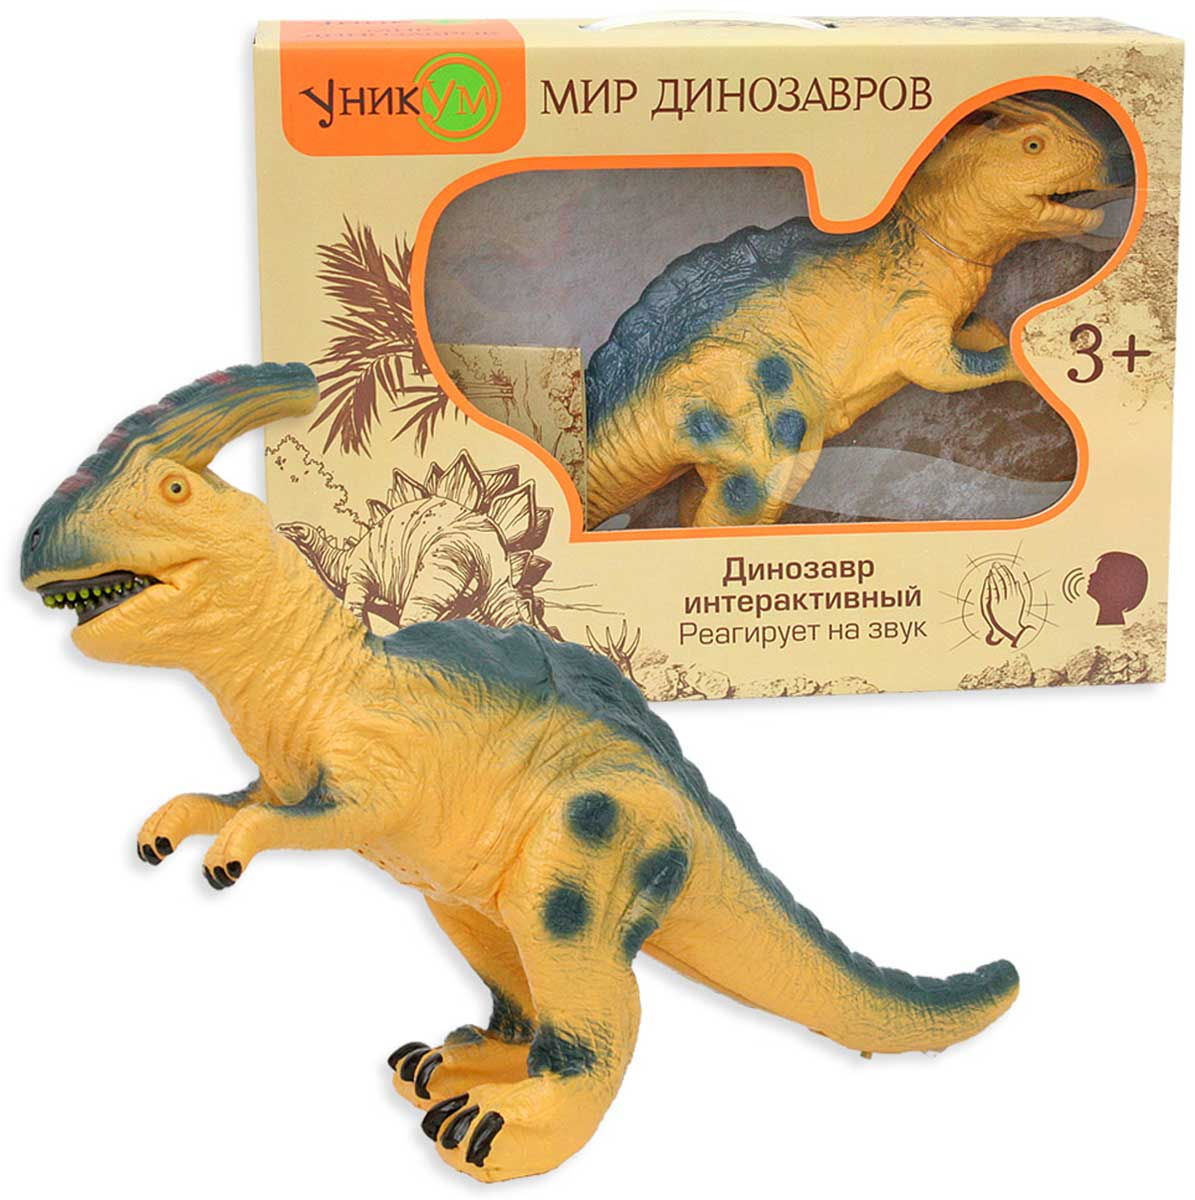 Ami&Co Интерактивная игрушка Динозавр Паразауролоф фигурки игрушки amico динозавр брахиозавр